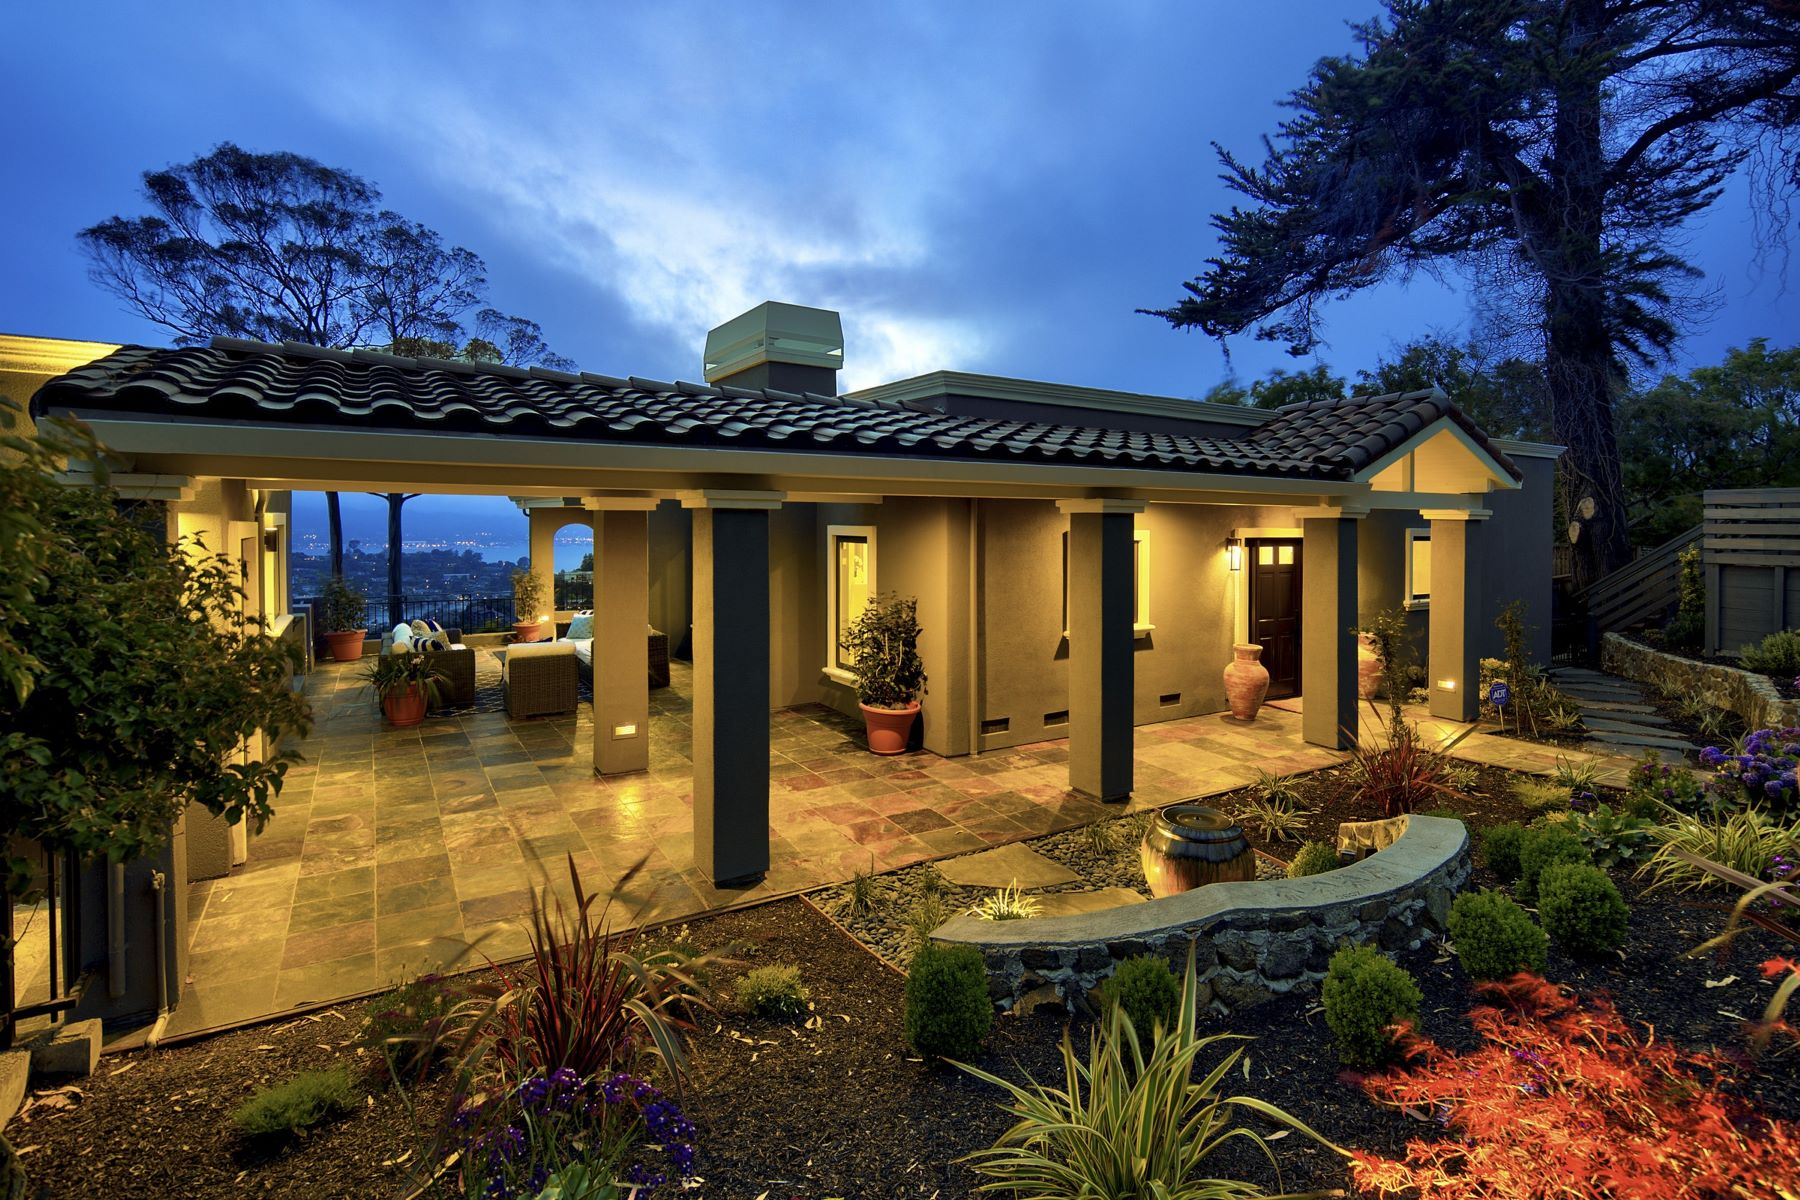 Casa Unifamiliar por un Venta en Unsurpassed Stunning Renovation! 1830 Mountain View Dr Tiburon, California 94920 Estados Unidos